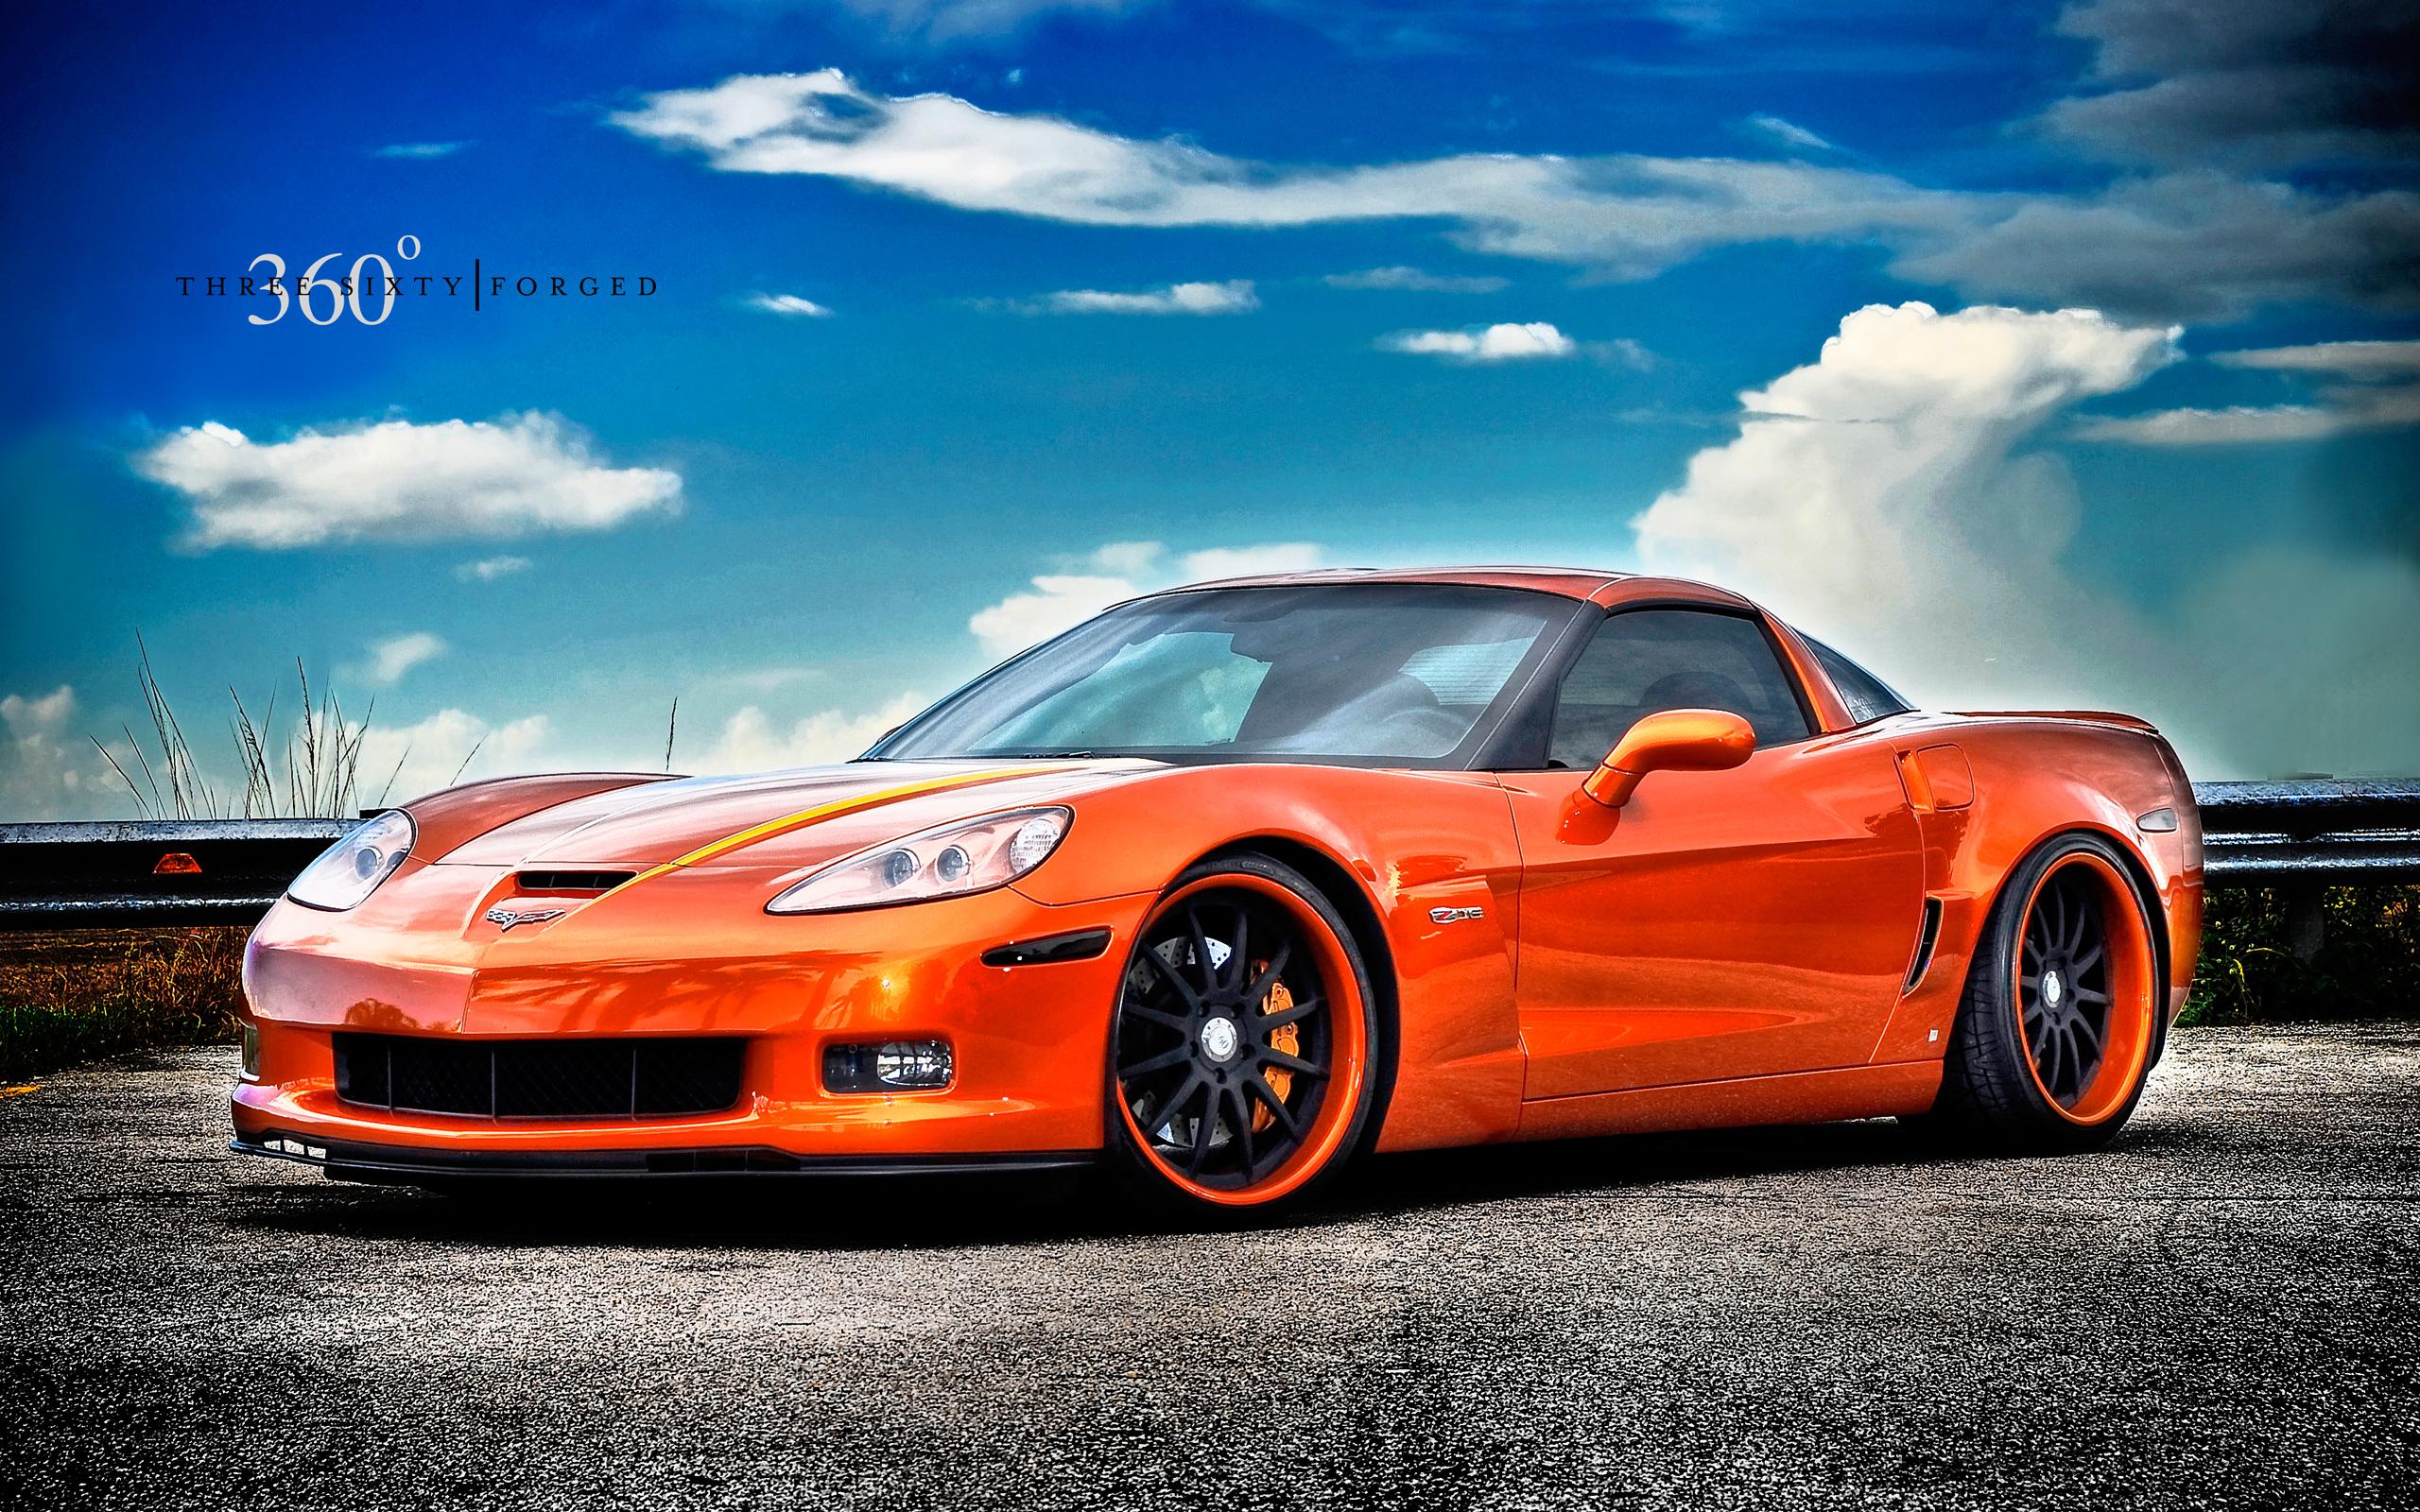 Corvette Z06 on 360 Forged Wheels Wallpaper HD Car Wallpapers 2560x1600